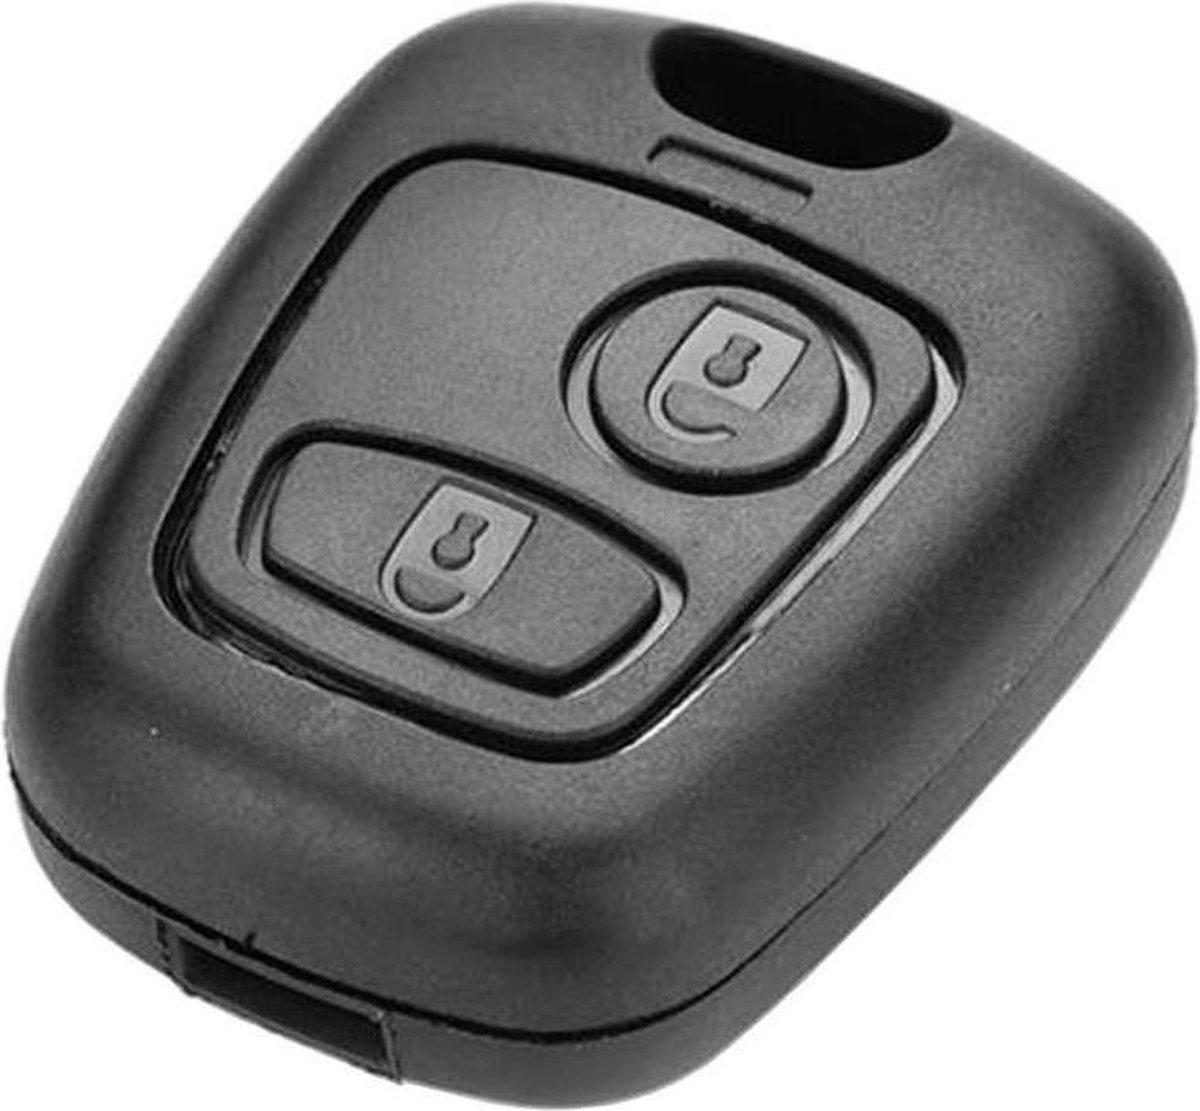 Autosleutelbehuizing - sleutelbehuizing auto - sleutelhoes - Autosleutel - Peugeot, Citroën en Toyot